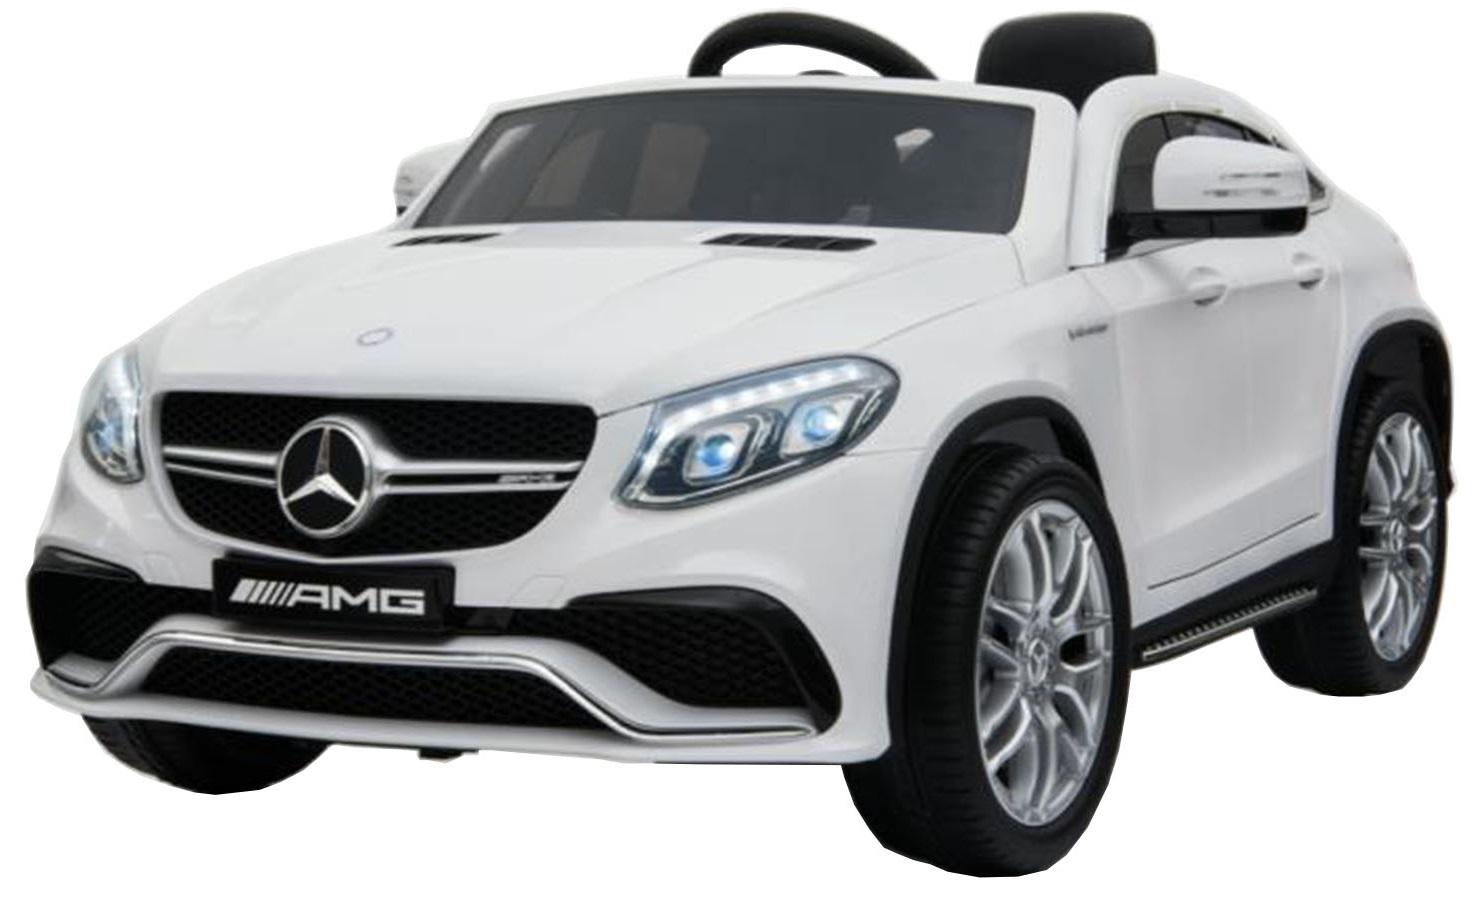 Masinuta electrica Premier Mercedes GLE 63 Coupe, 12V, roti cauciuc EVA, scaun piele ecologica, alba